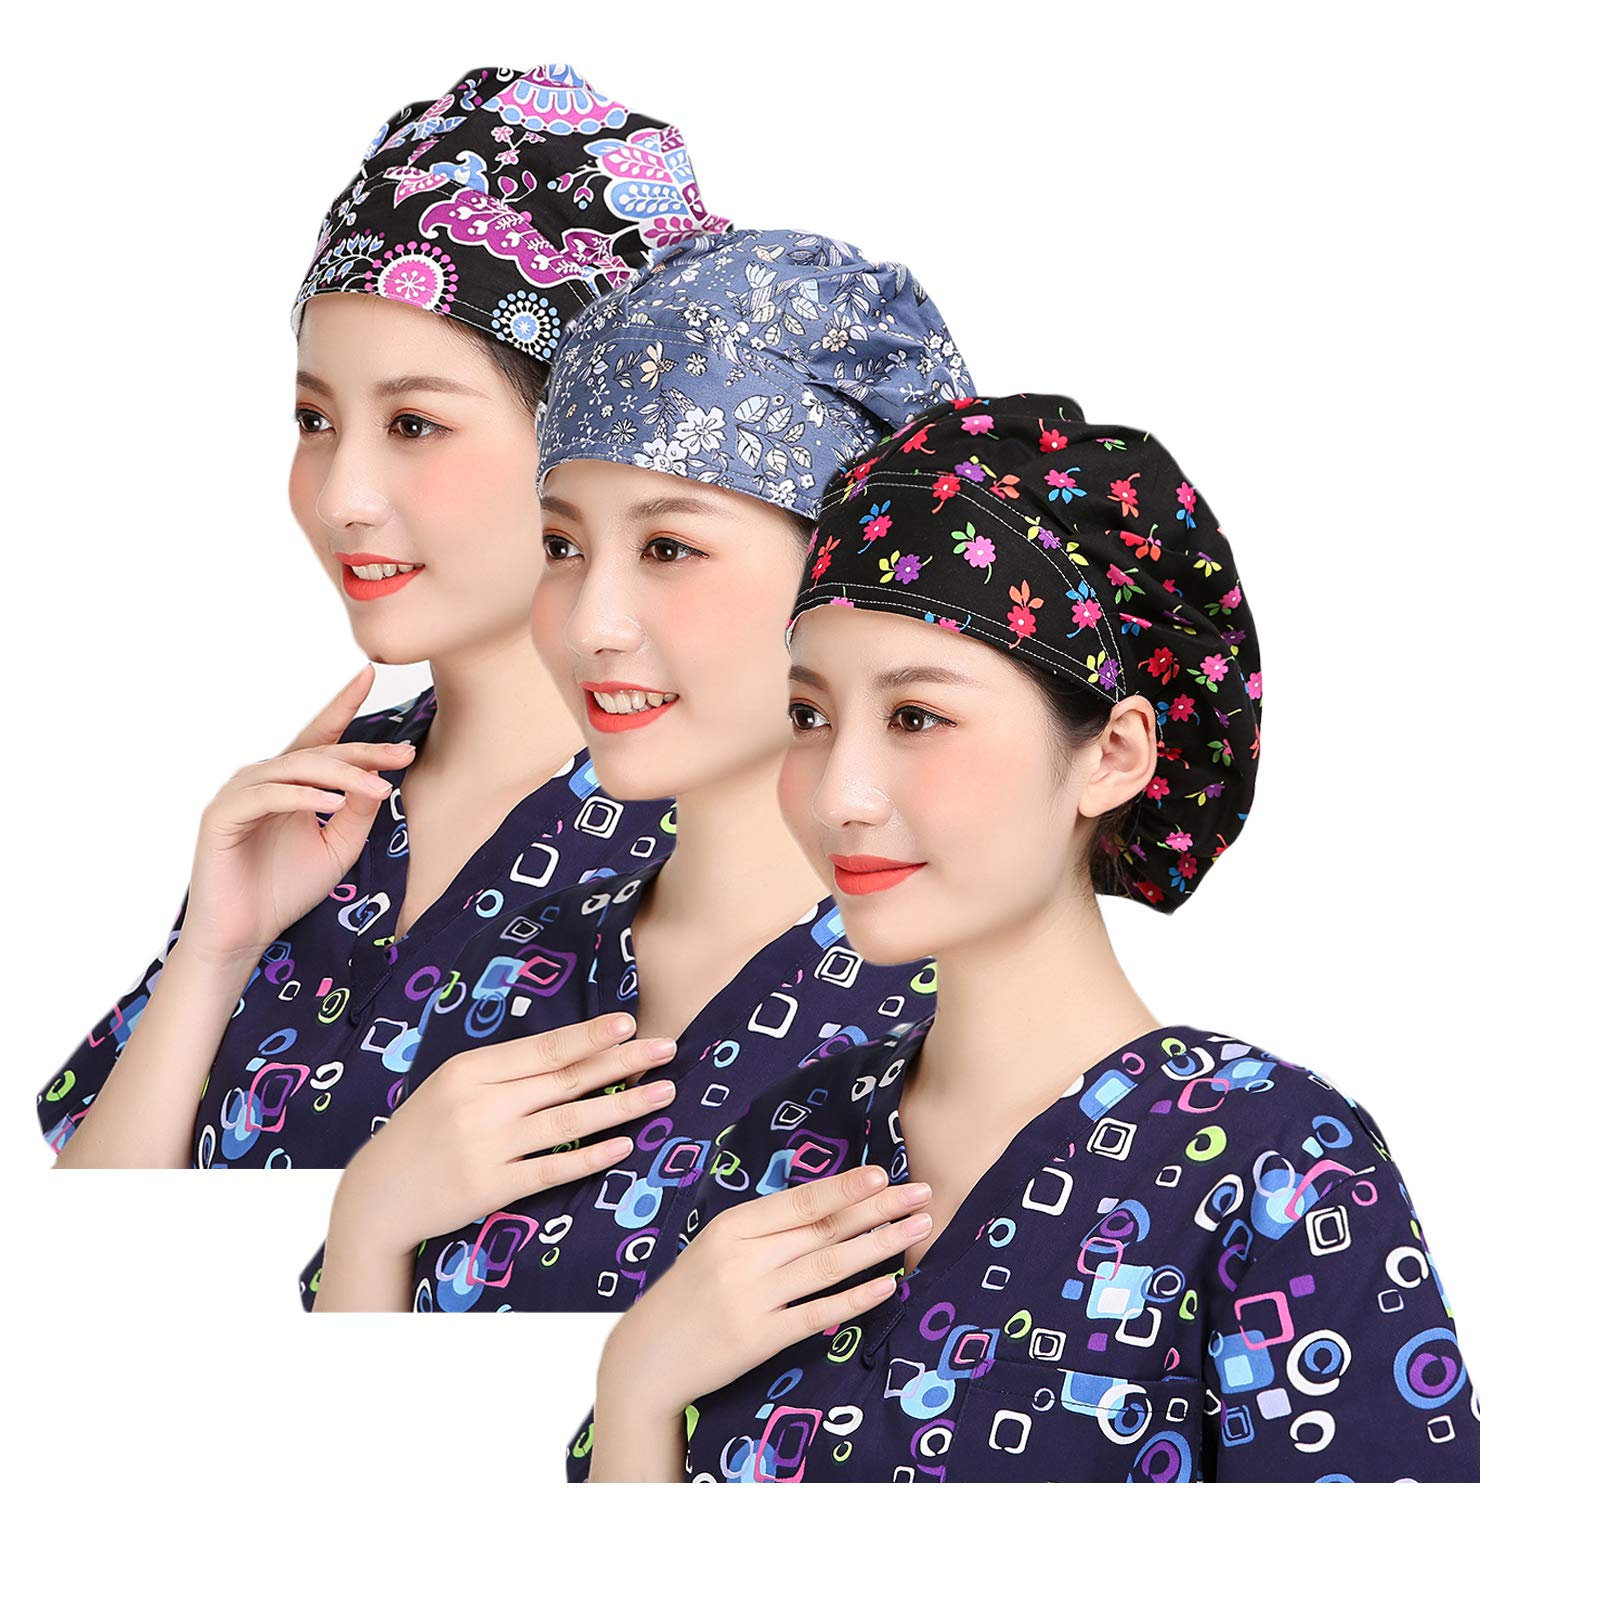 Nothar 3pc Women's Adjustable Scrub Cap Sweatband Bouffant Hats Value Set by Nothar